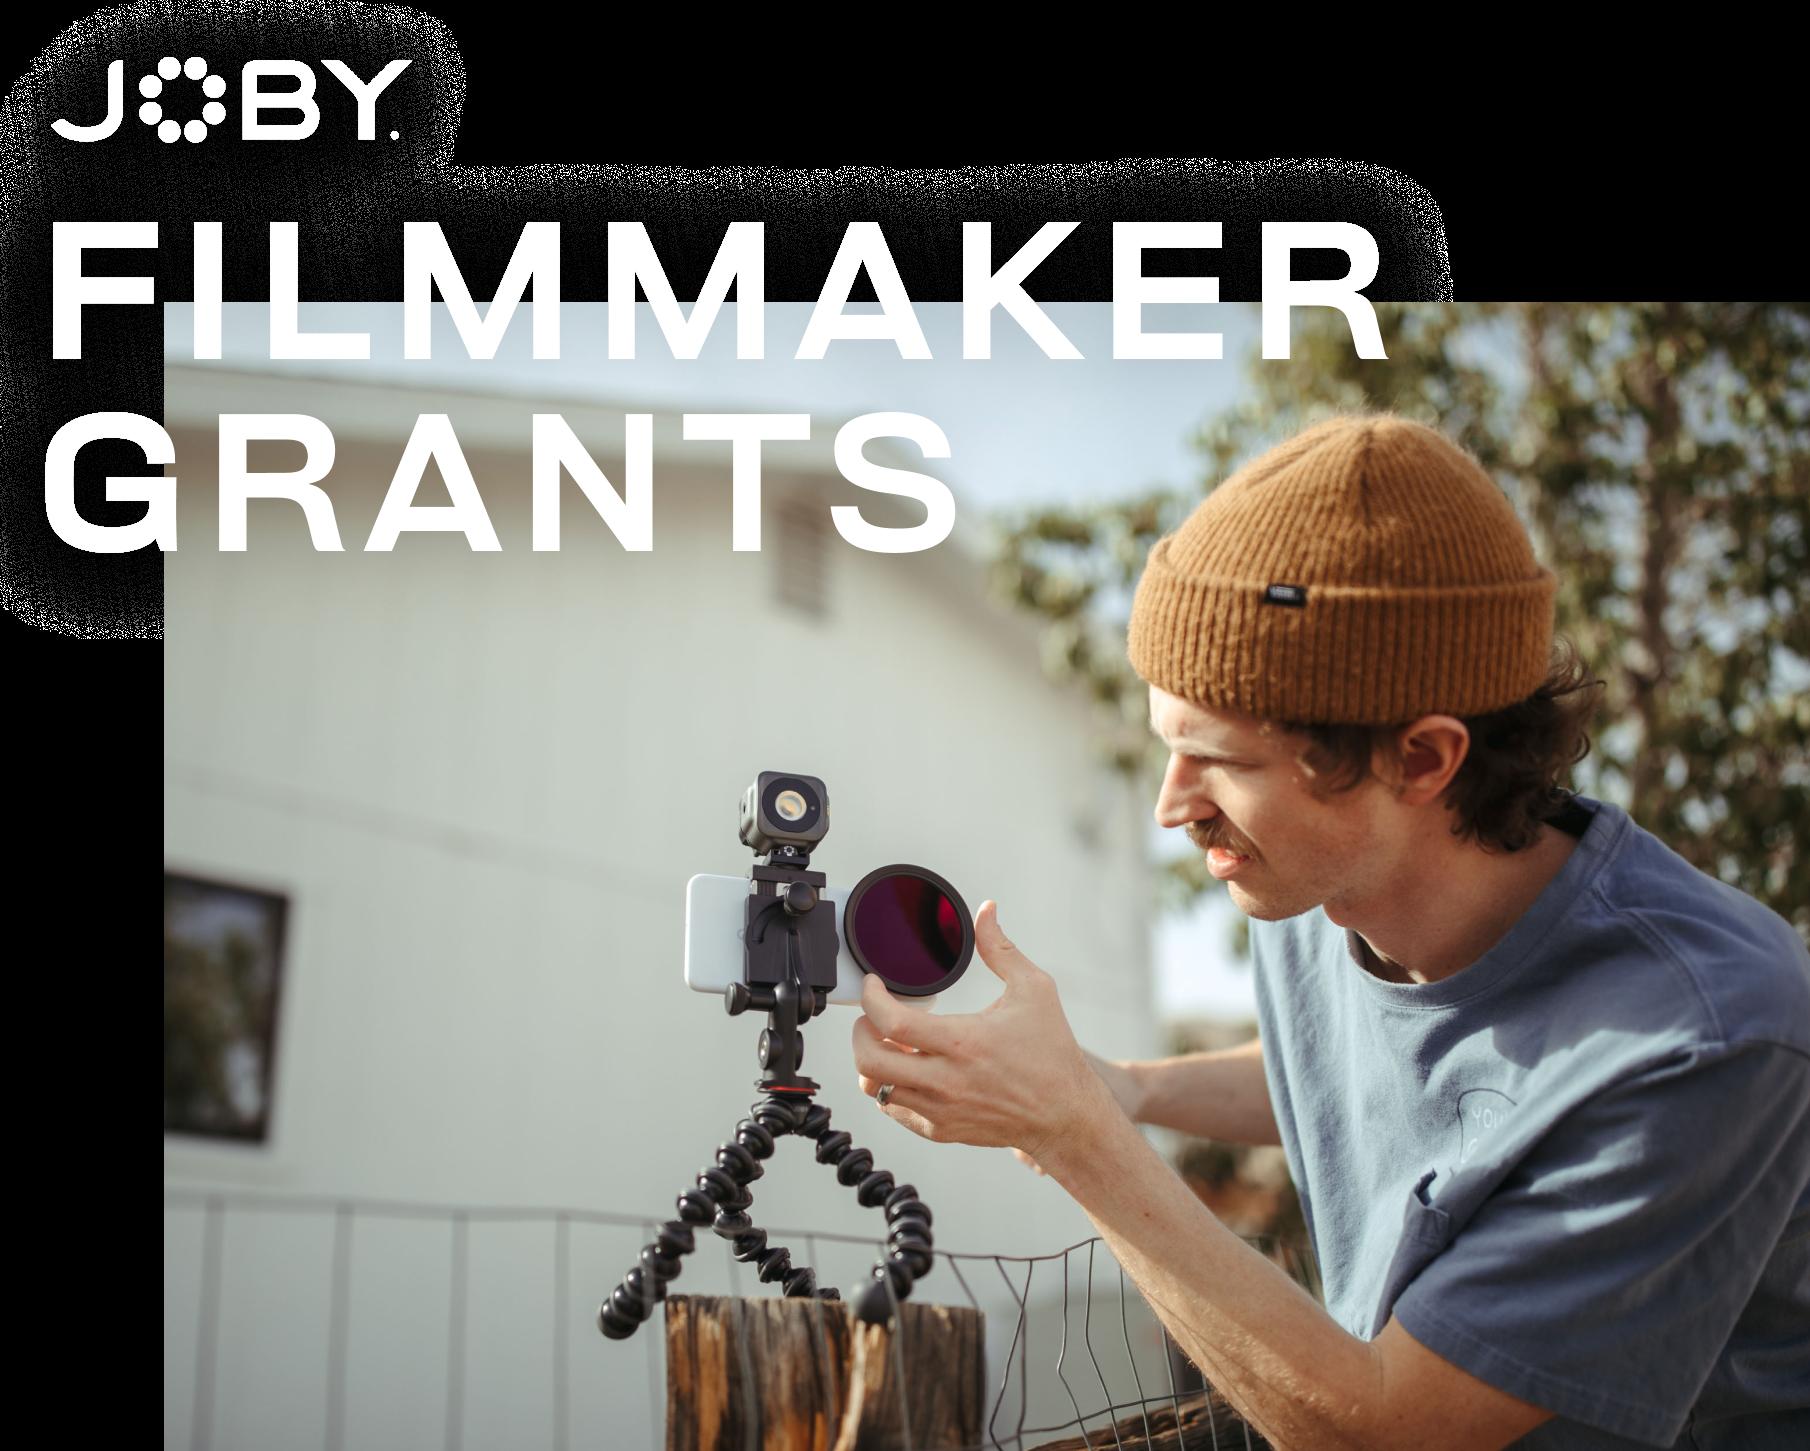 JOBY Filmmaker Grants